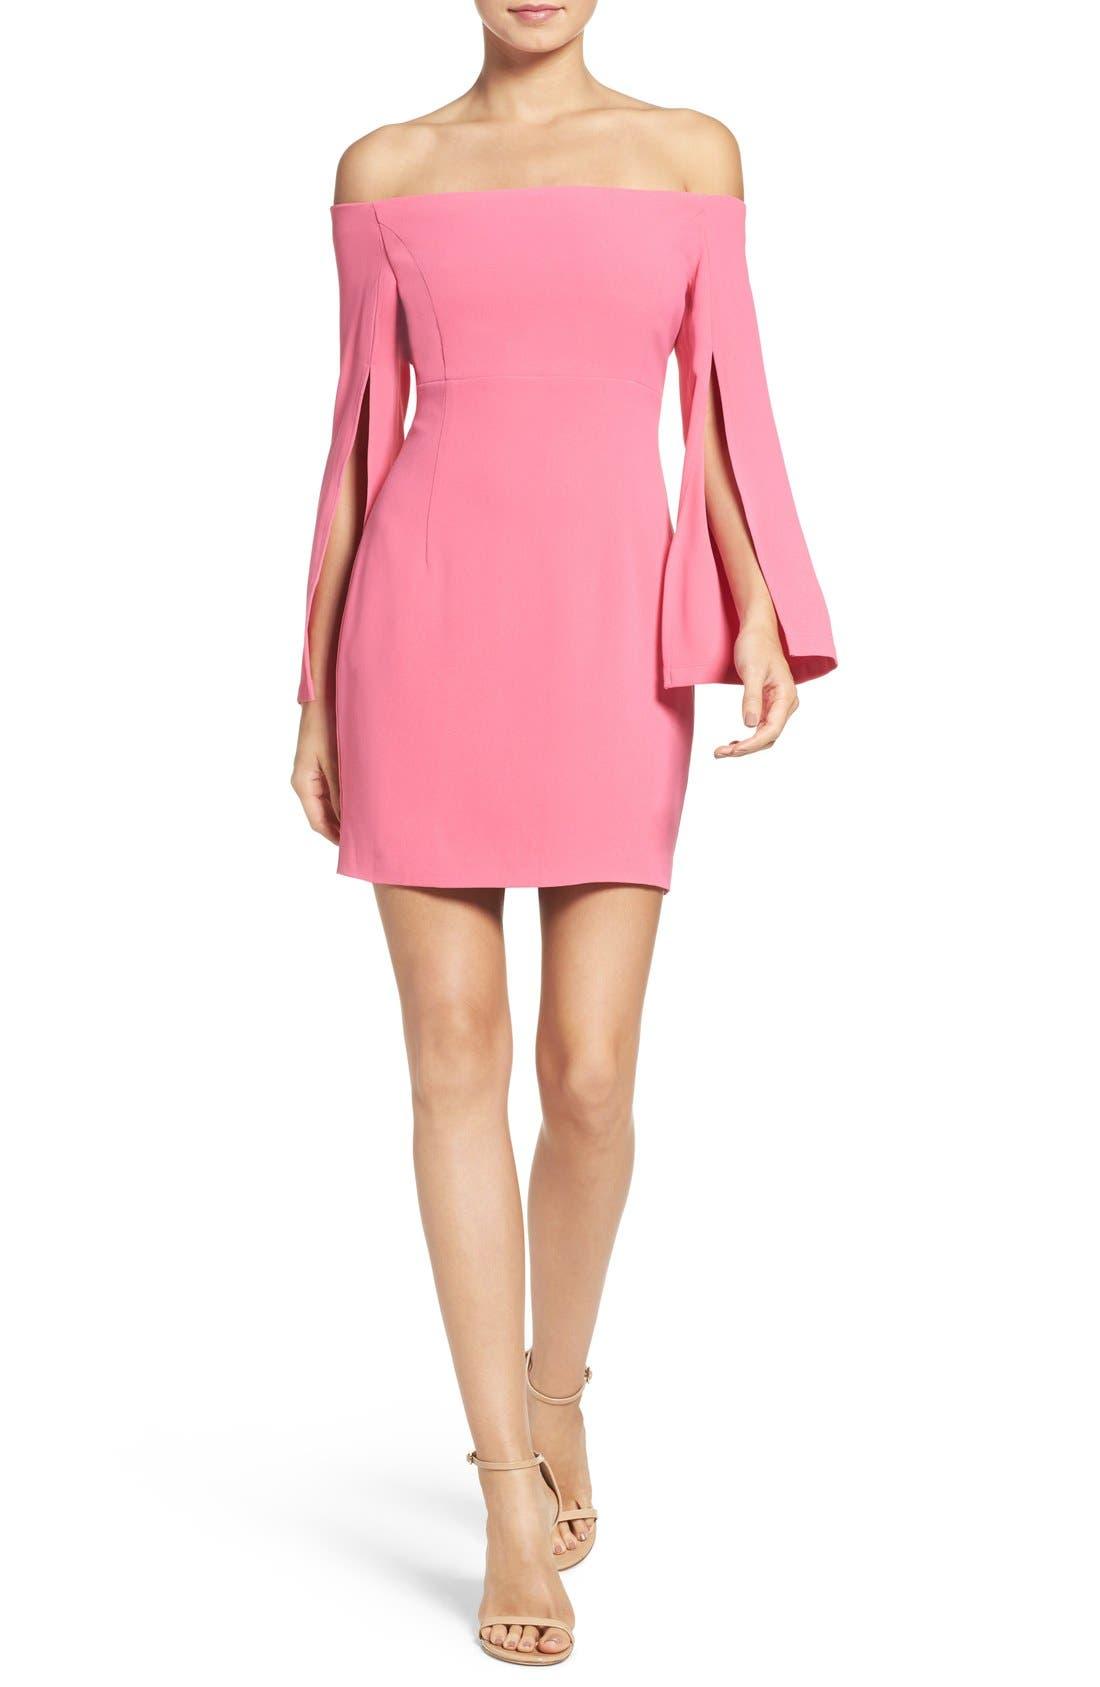 Ava Off the Shoulder Dress,                             Alternate thumbnail 4, color,                             Tulip Pink